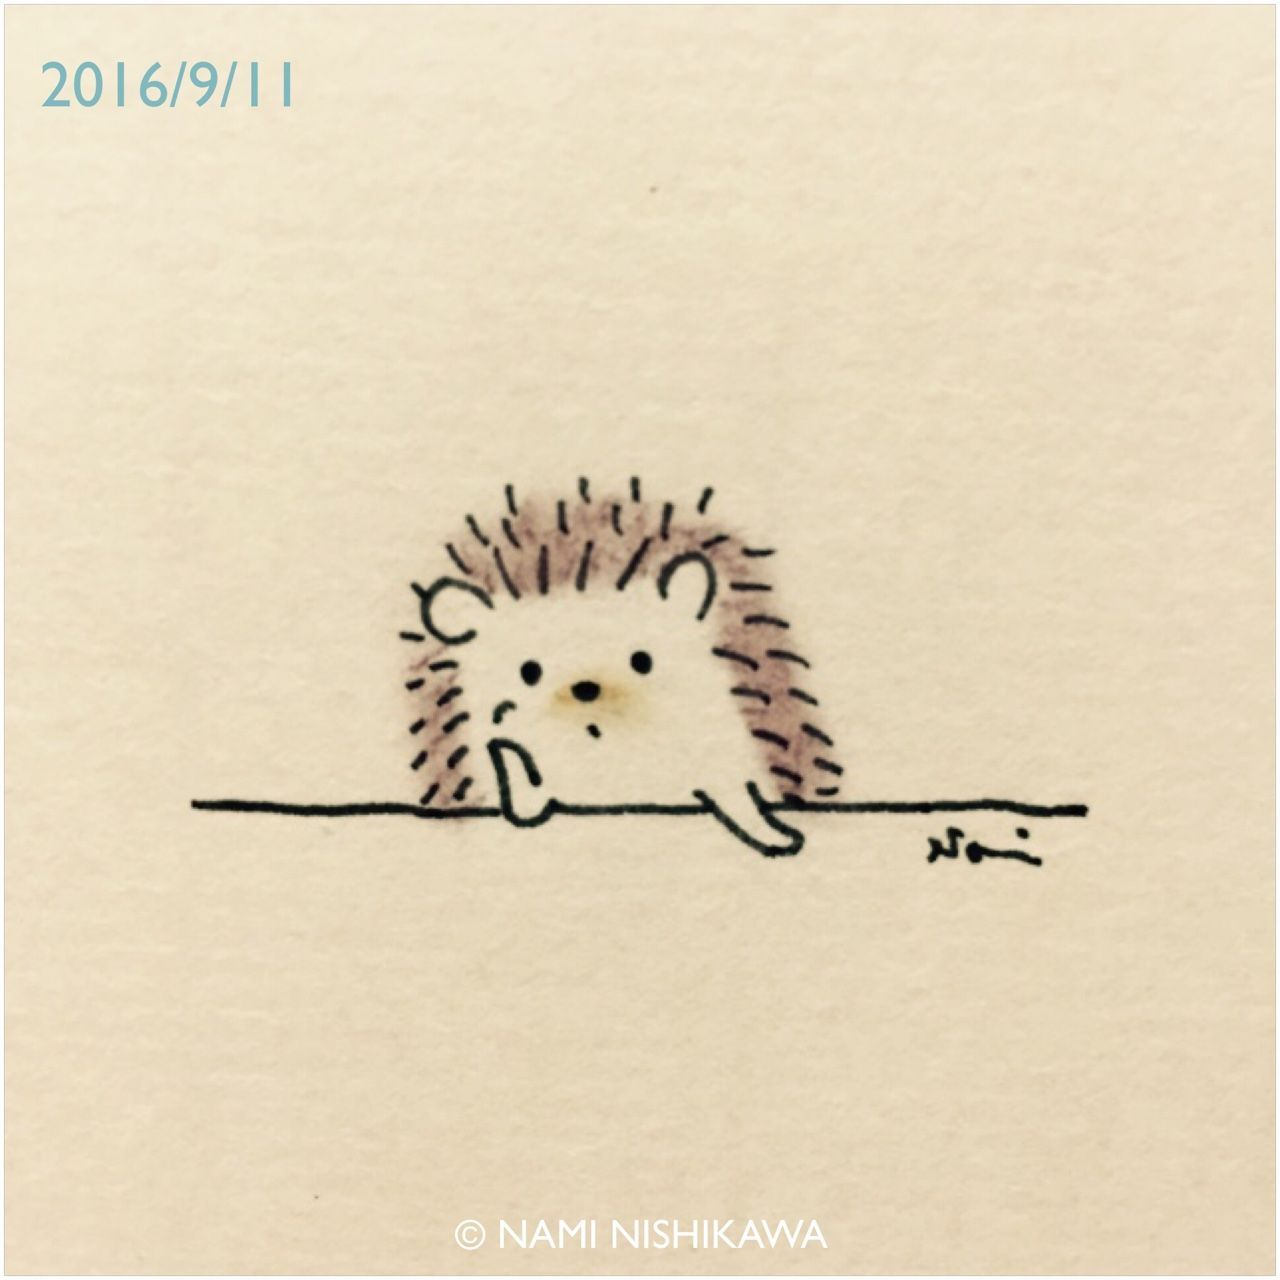 Hedgehog Drawing At Getdrawings Com Free For Personal Use Hedgehog